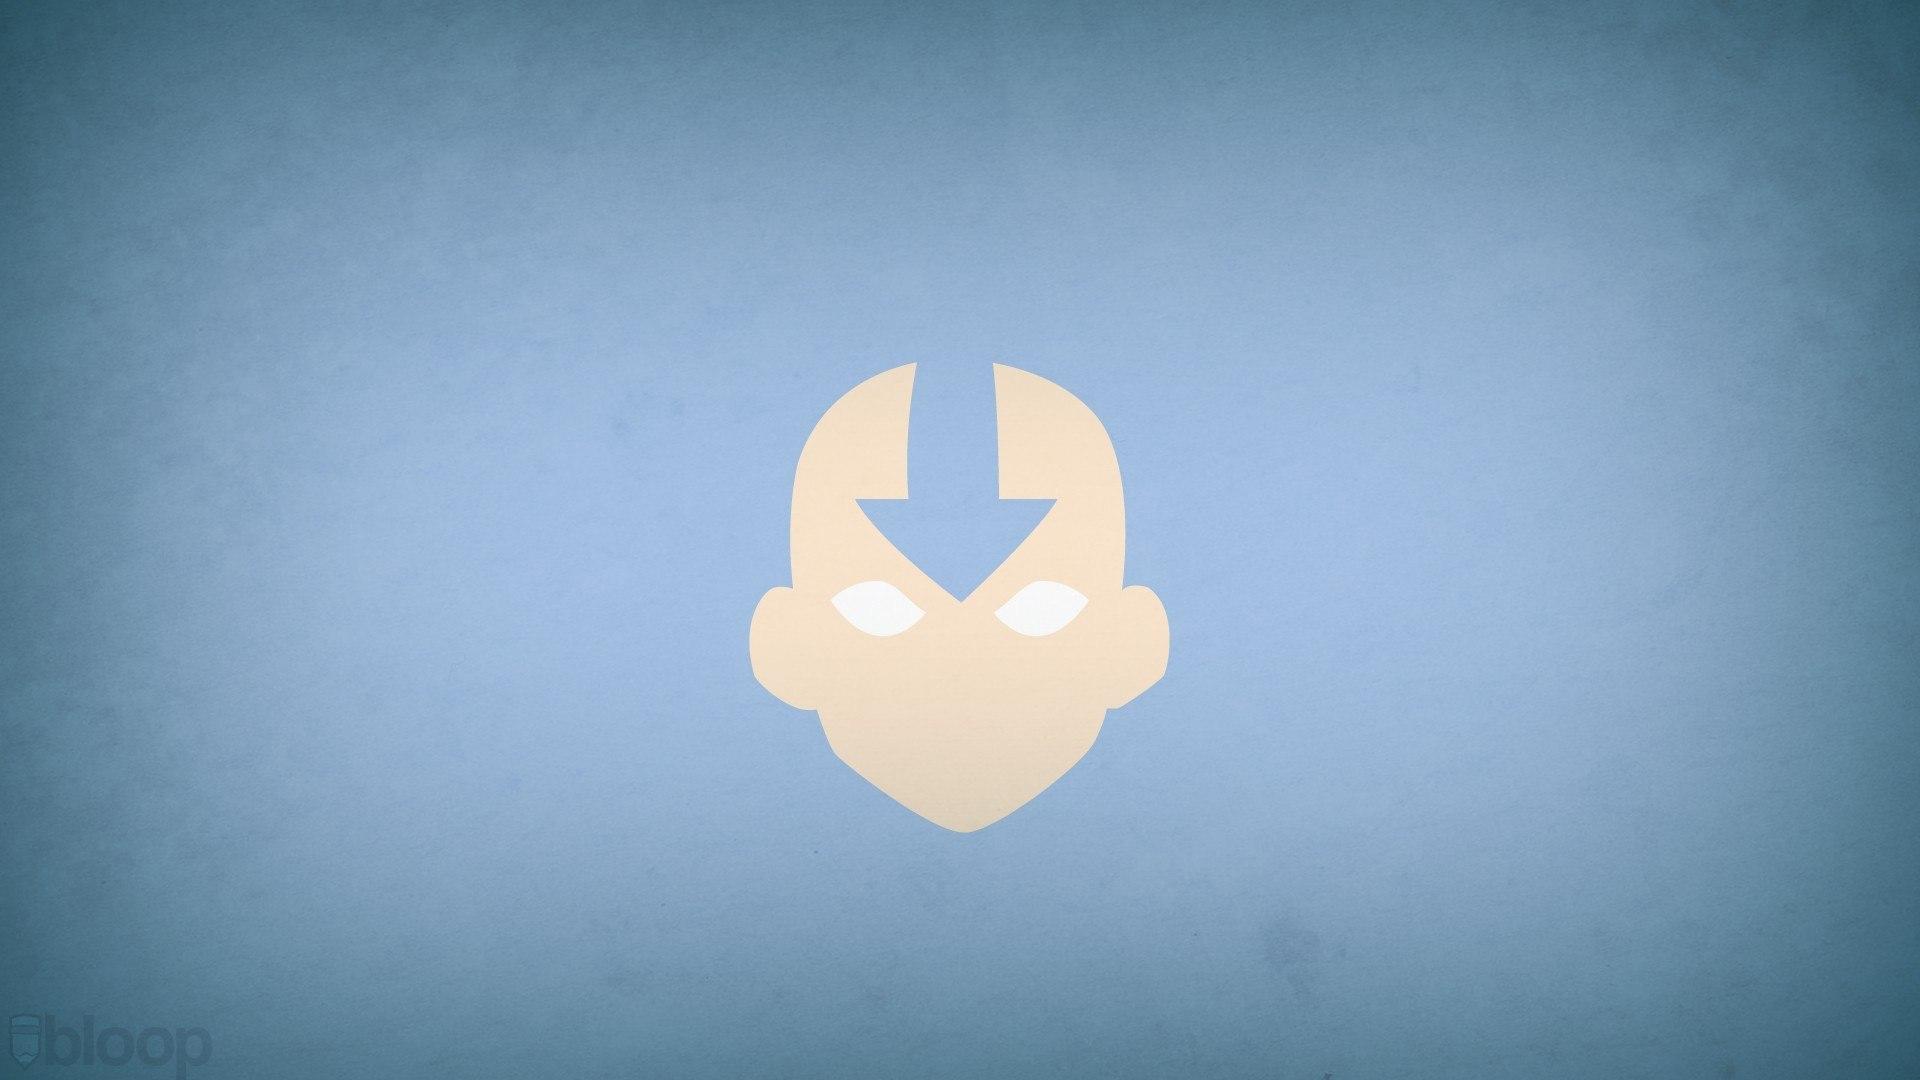 Avatar the last Airbender wallpaper (17)